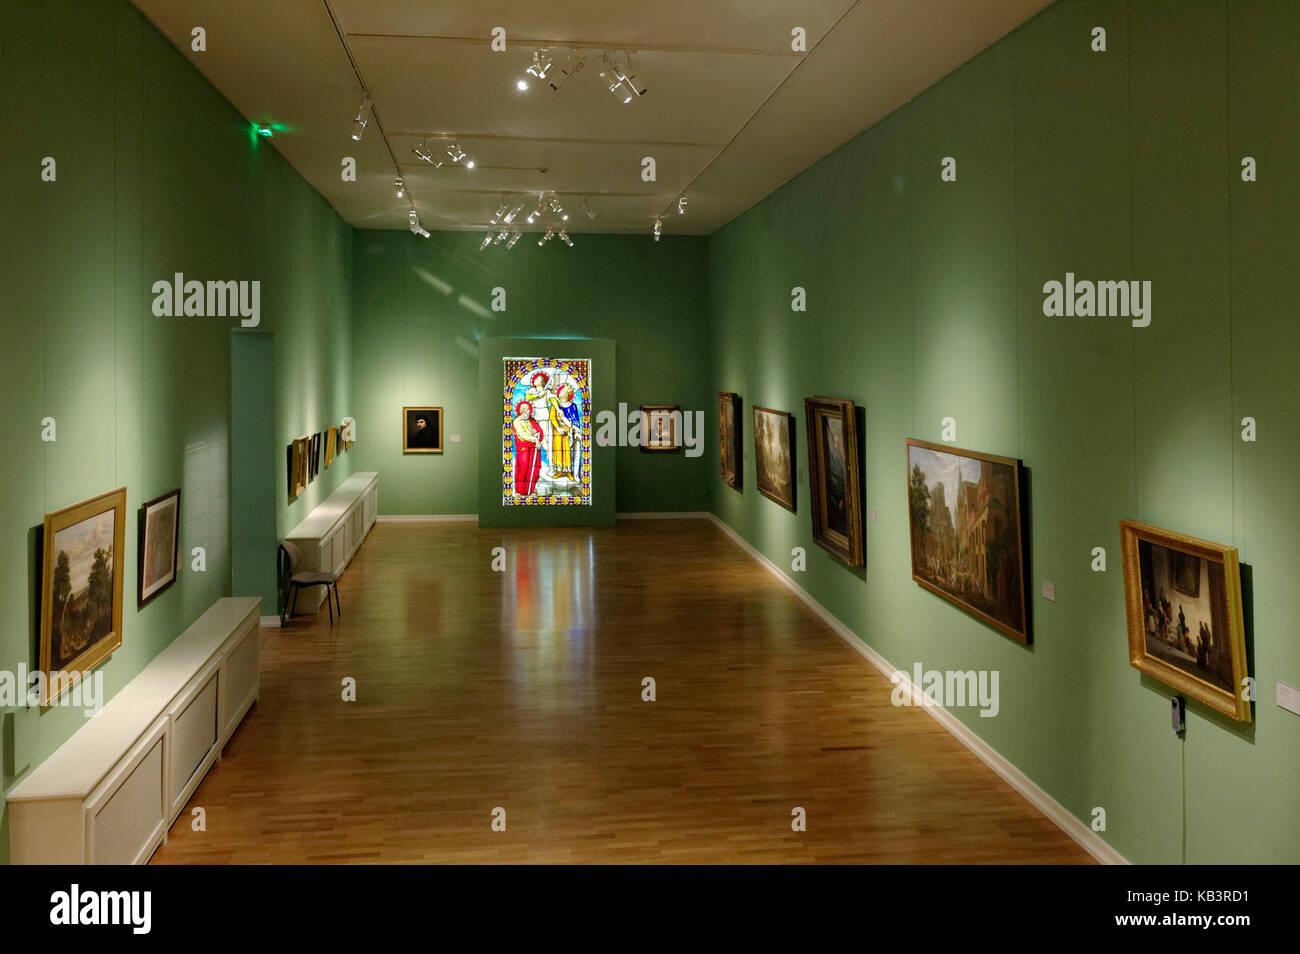 "Frankreich, Moselle, das Museum der ""Cour d'Or - Metz Métropole', Schule von Metz. Stockbild"